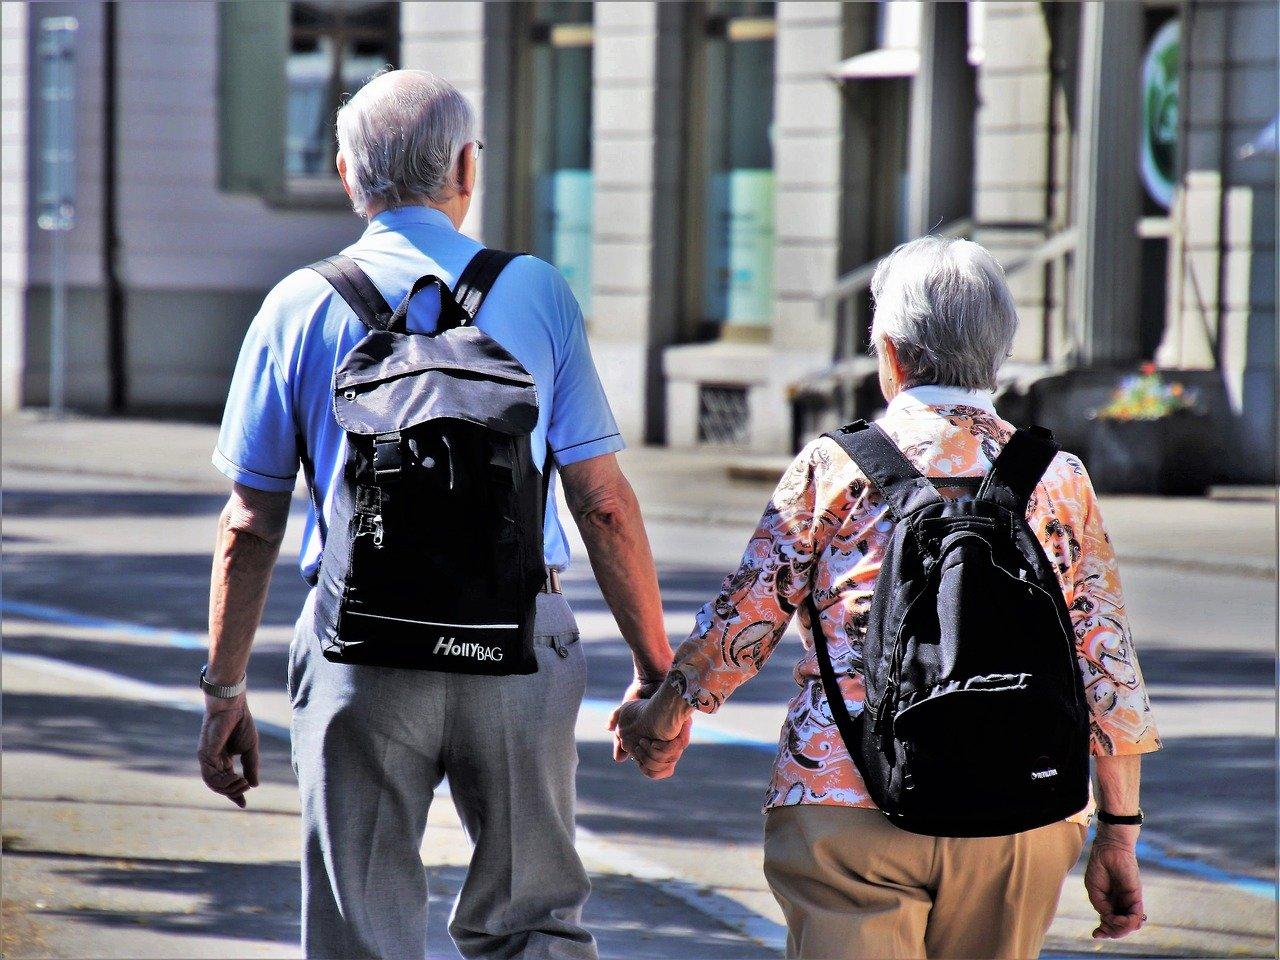 Pensioni ultime notizie assegno 67 anni beffa